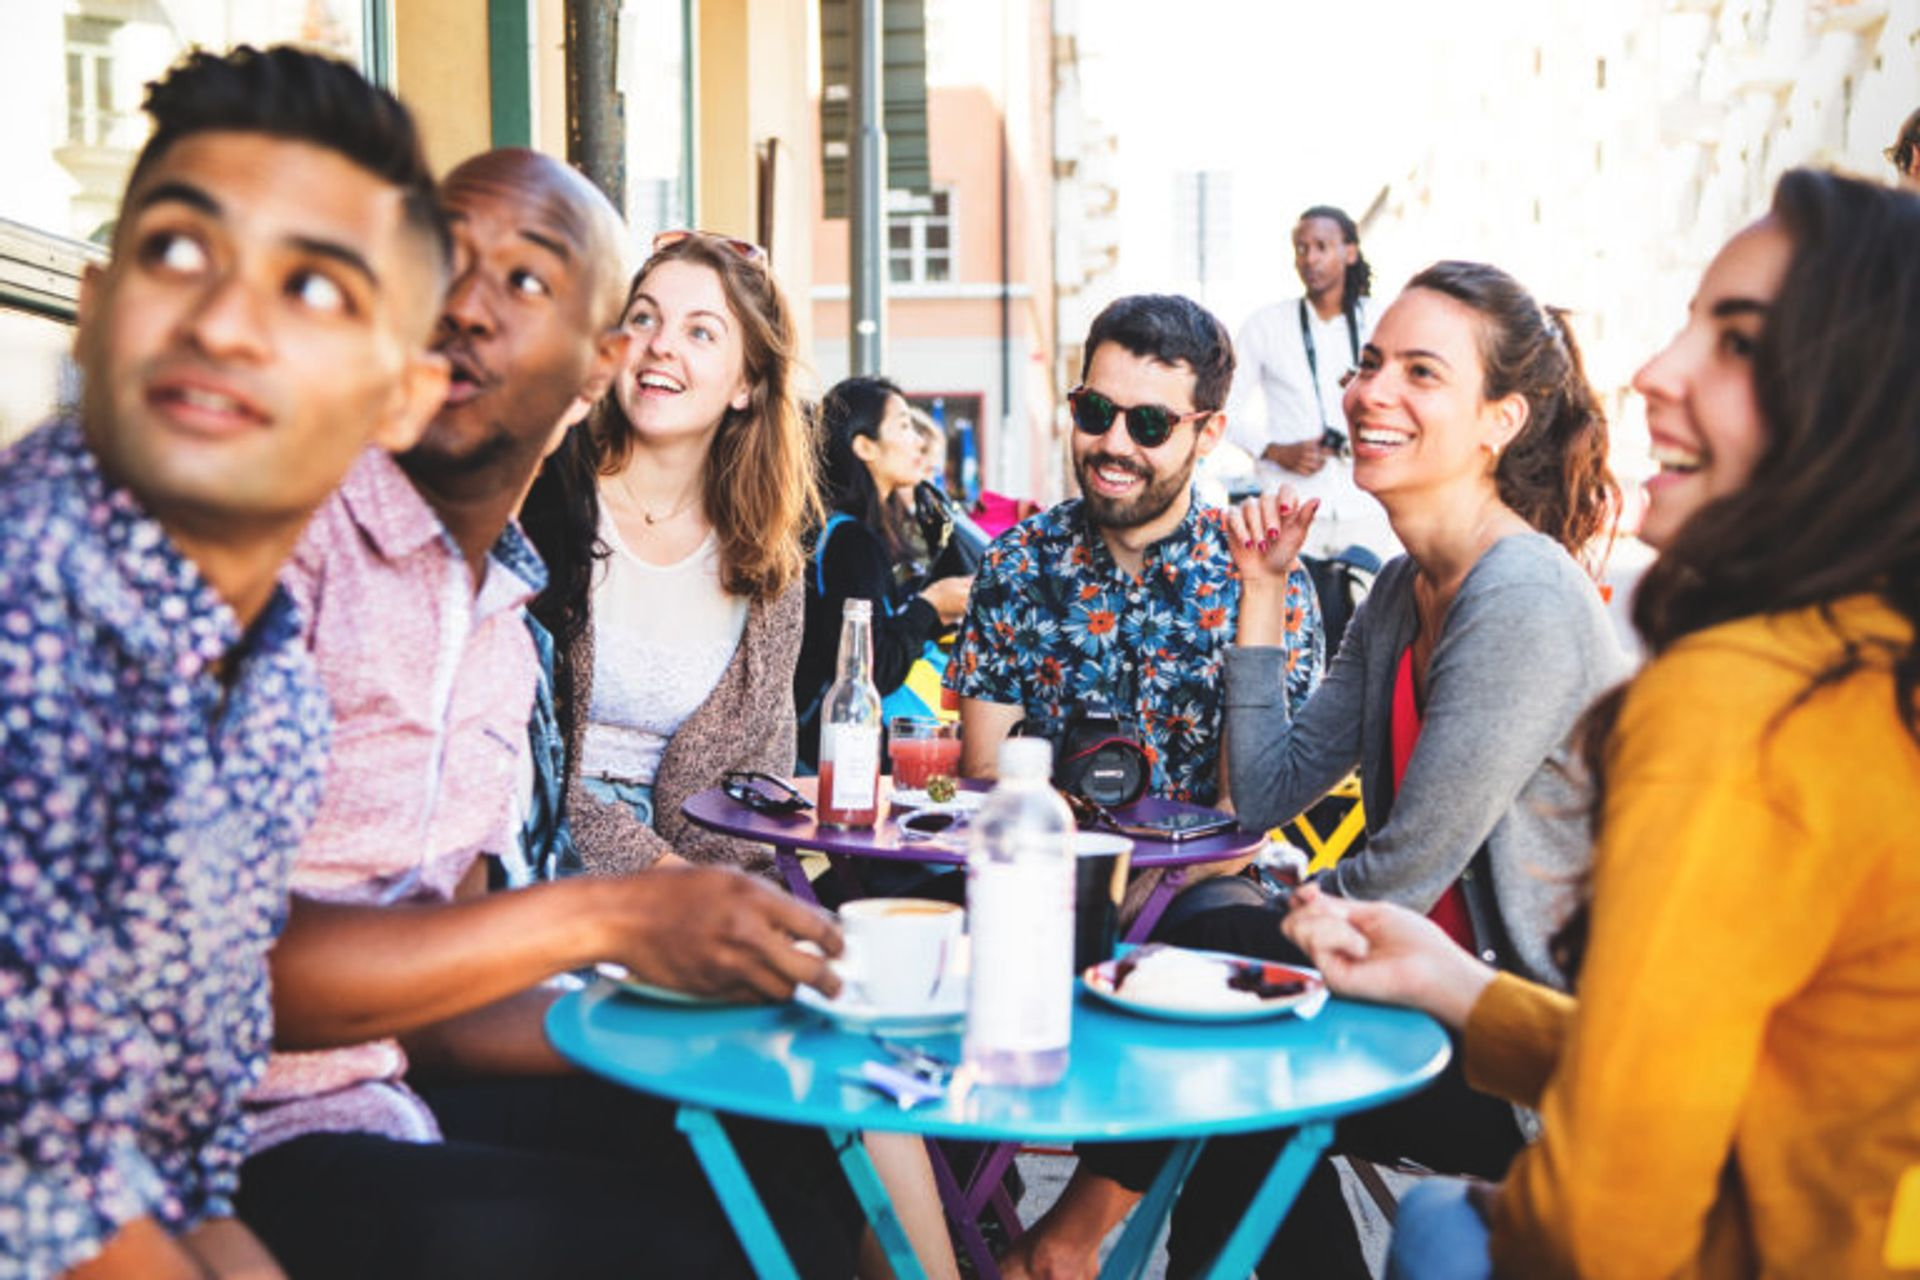 Students having fika at an outdoors cafe.